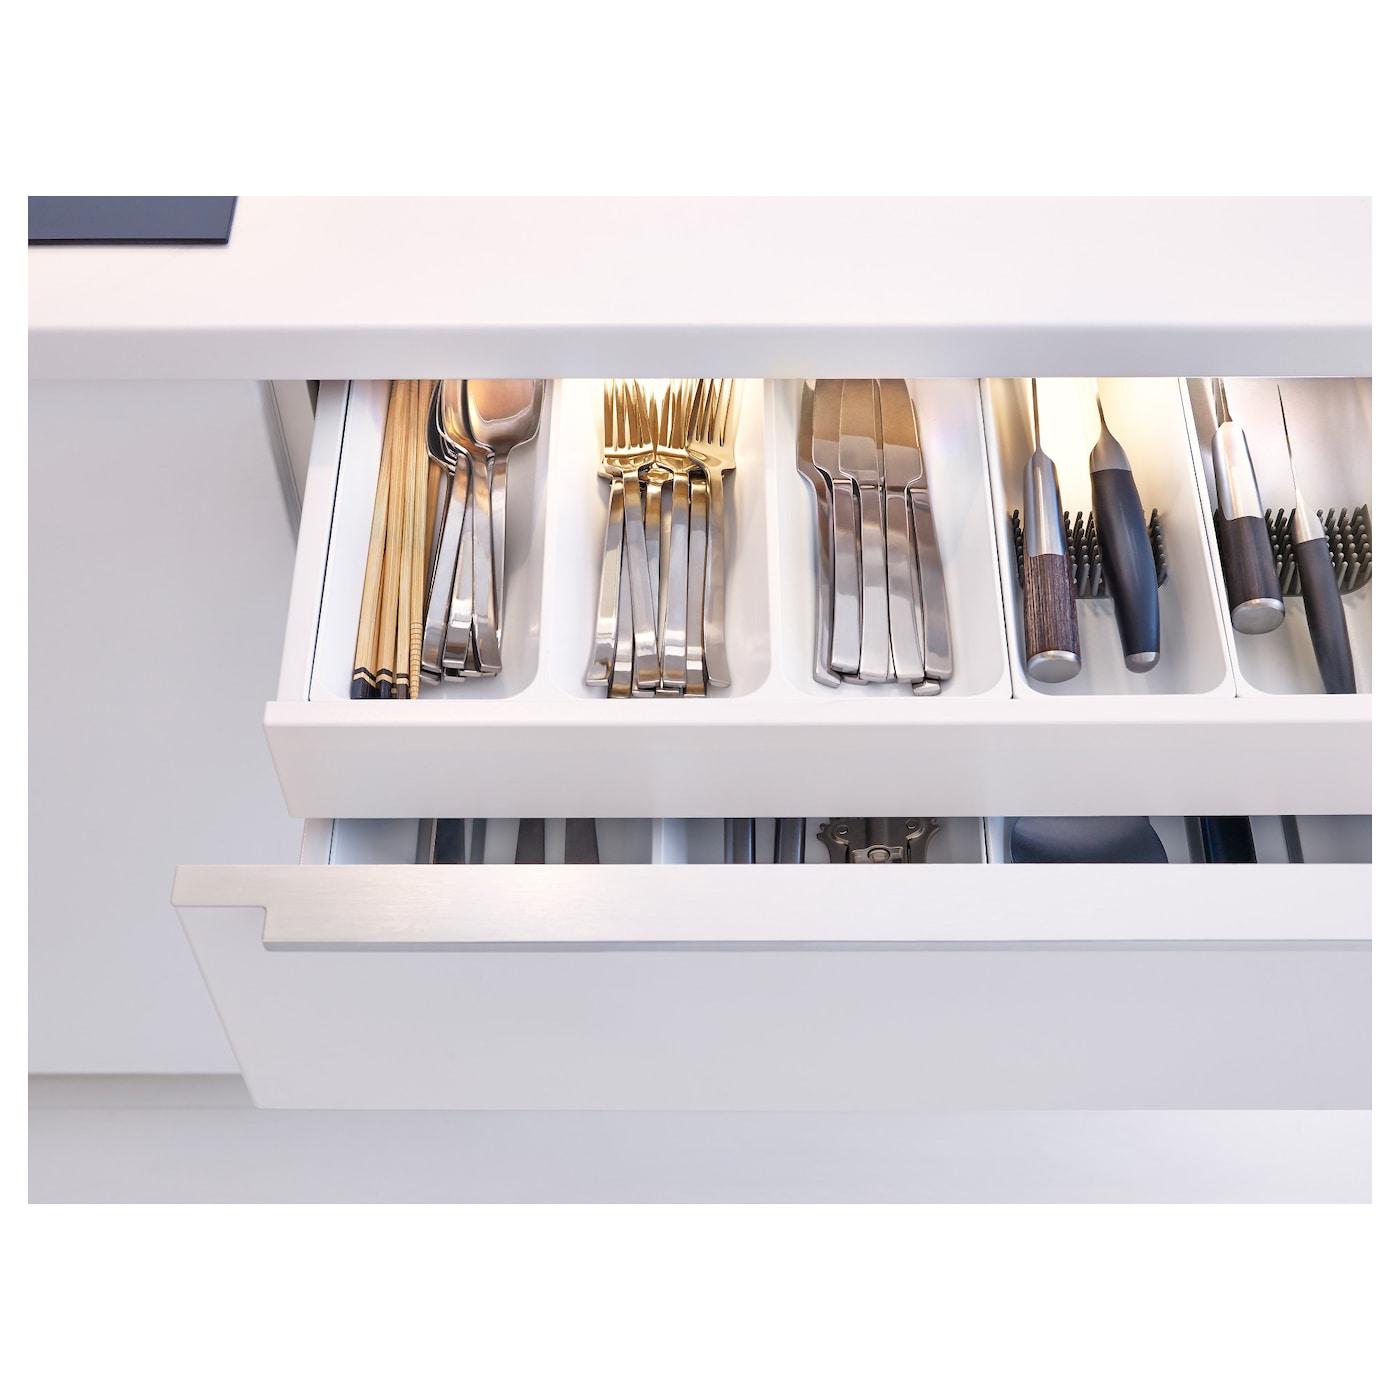 omlopp led lighting strip for drawers aluminium colour 56 cm ikea. Black Bedroom Furniture Sets. Home Design Ideas